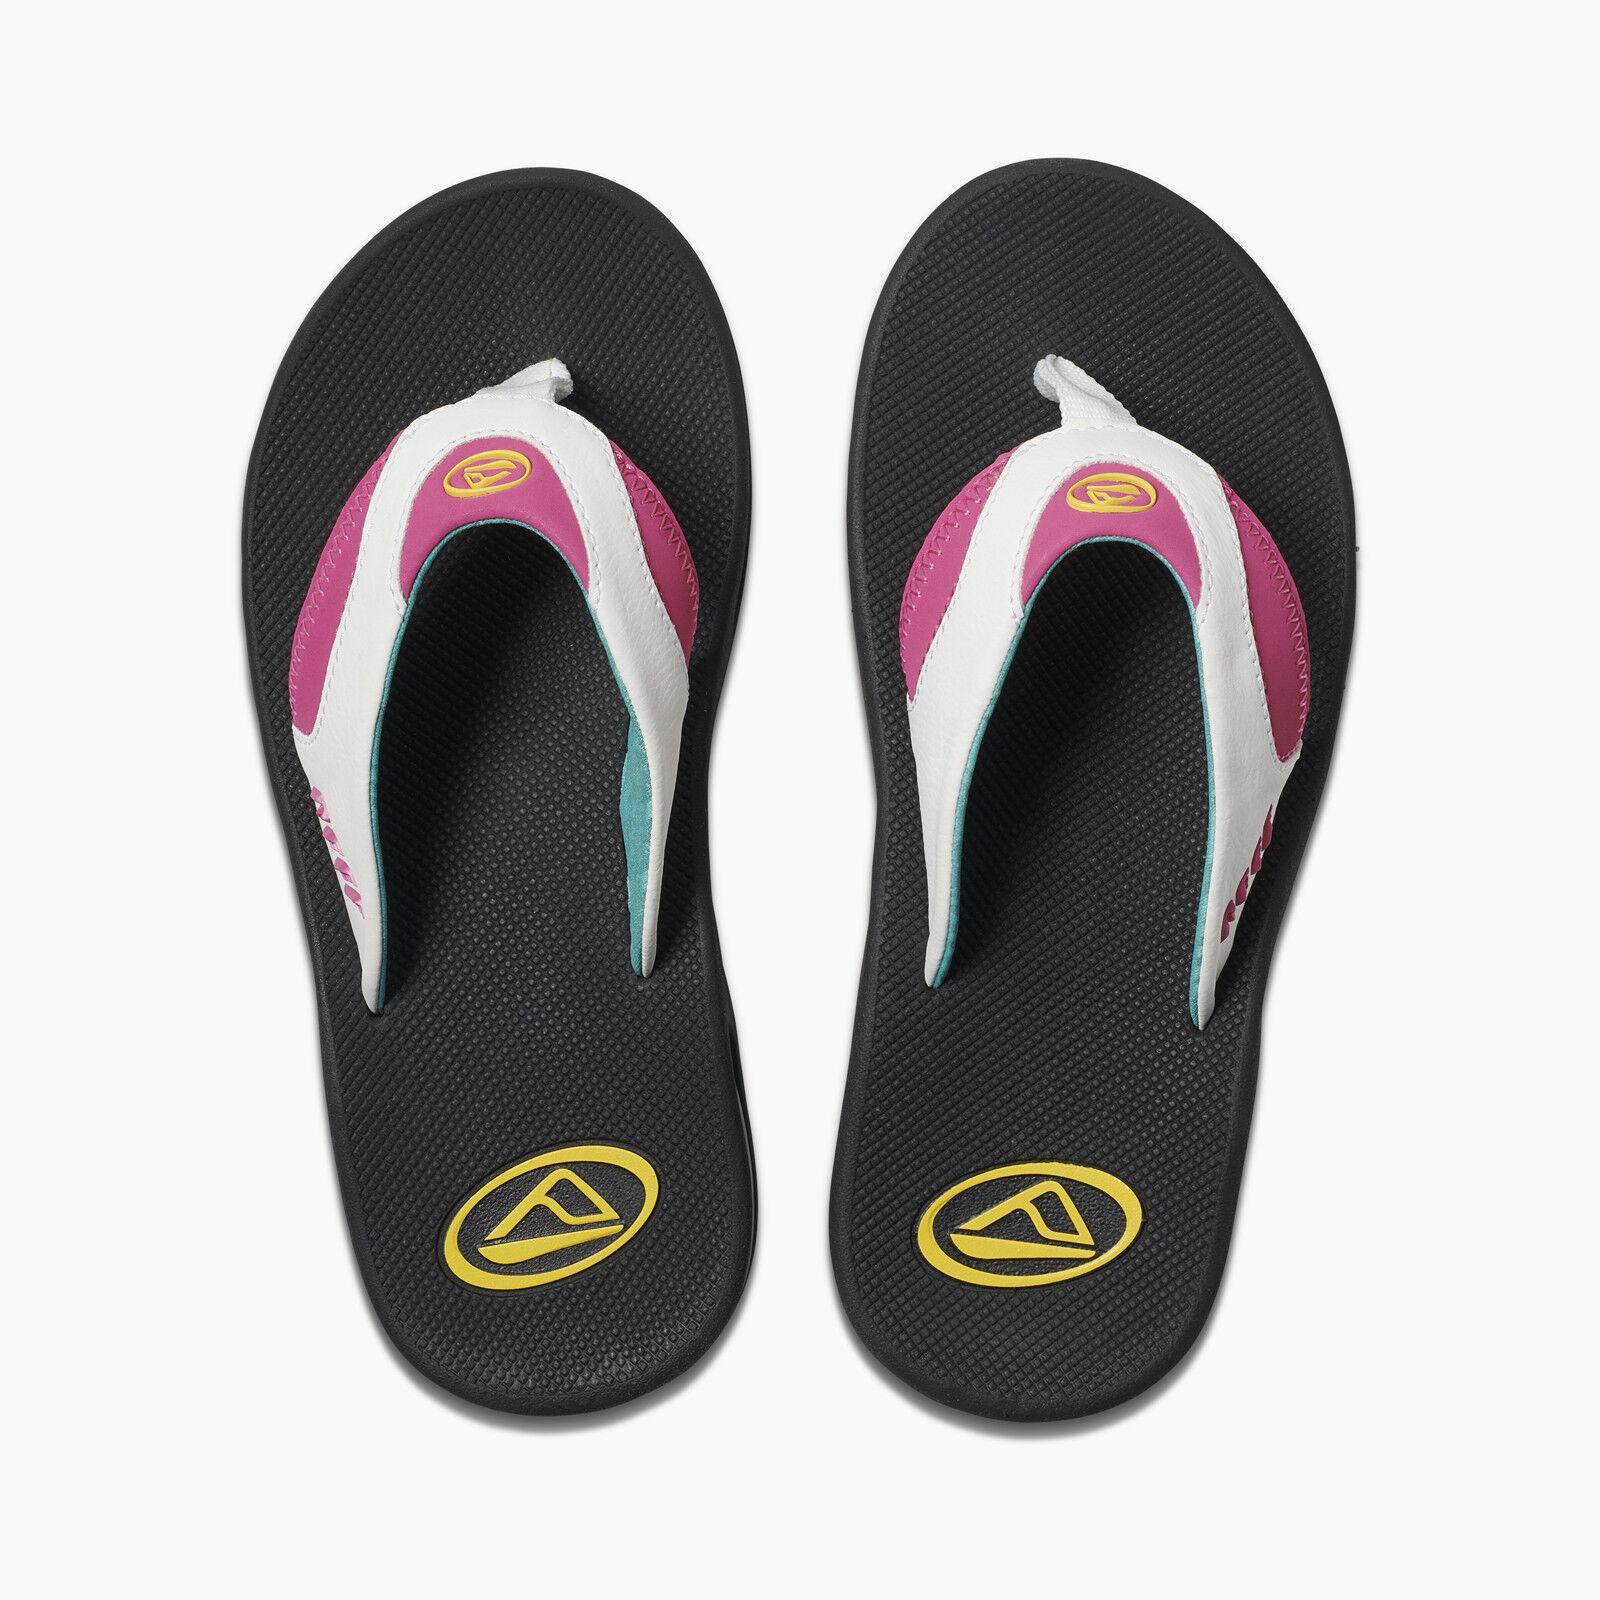 Reef Femme Femme Femme Flip Flops. Fanning Arch Support water friendly Sandal Tongs 9 S 26 B 02ba19